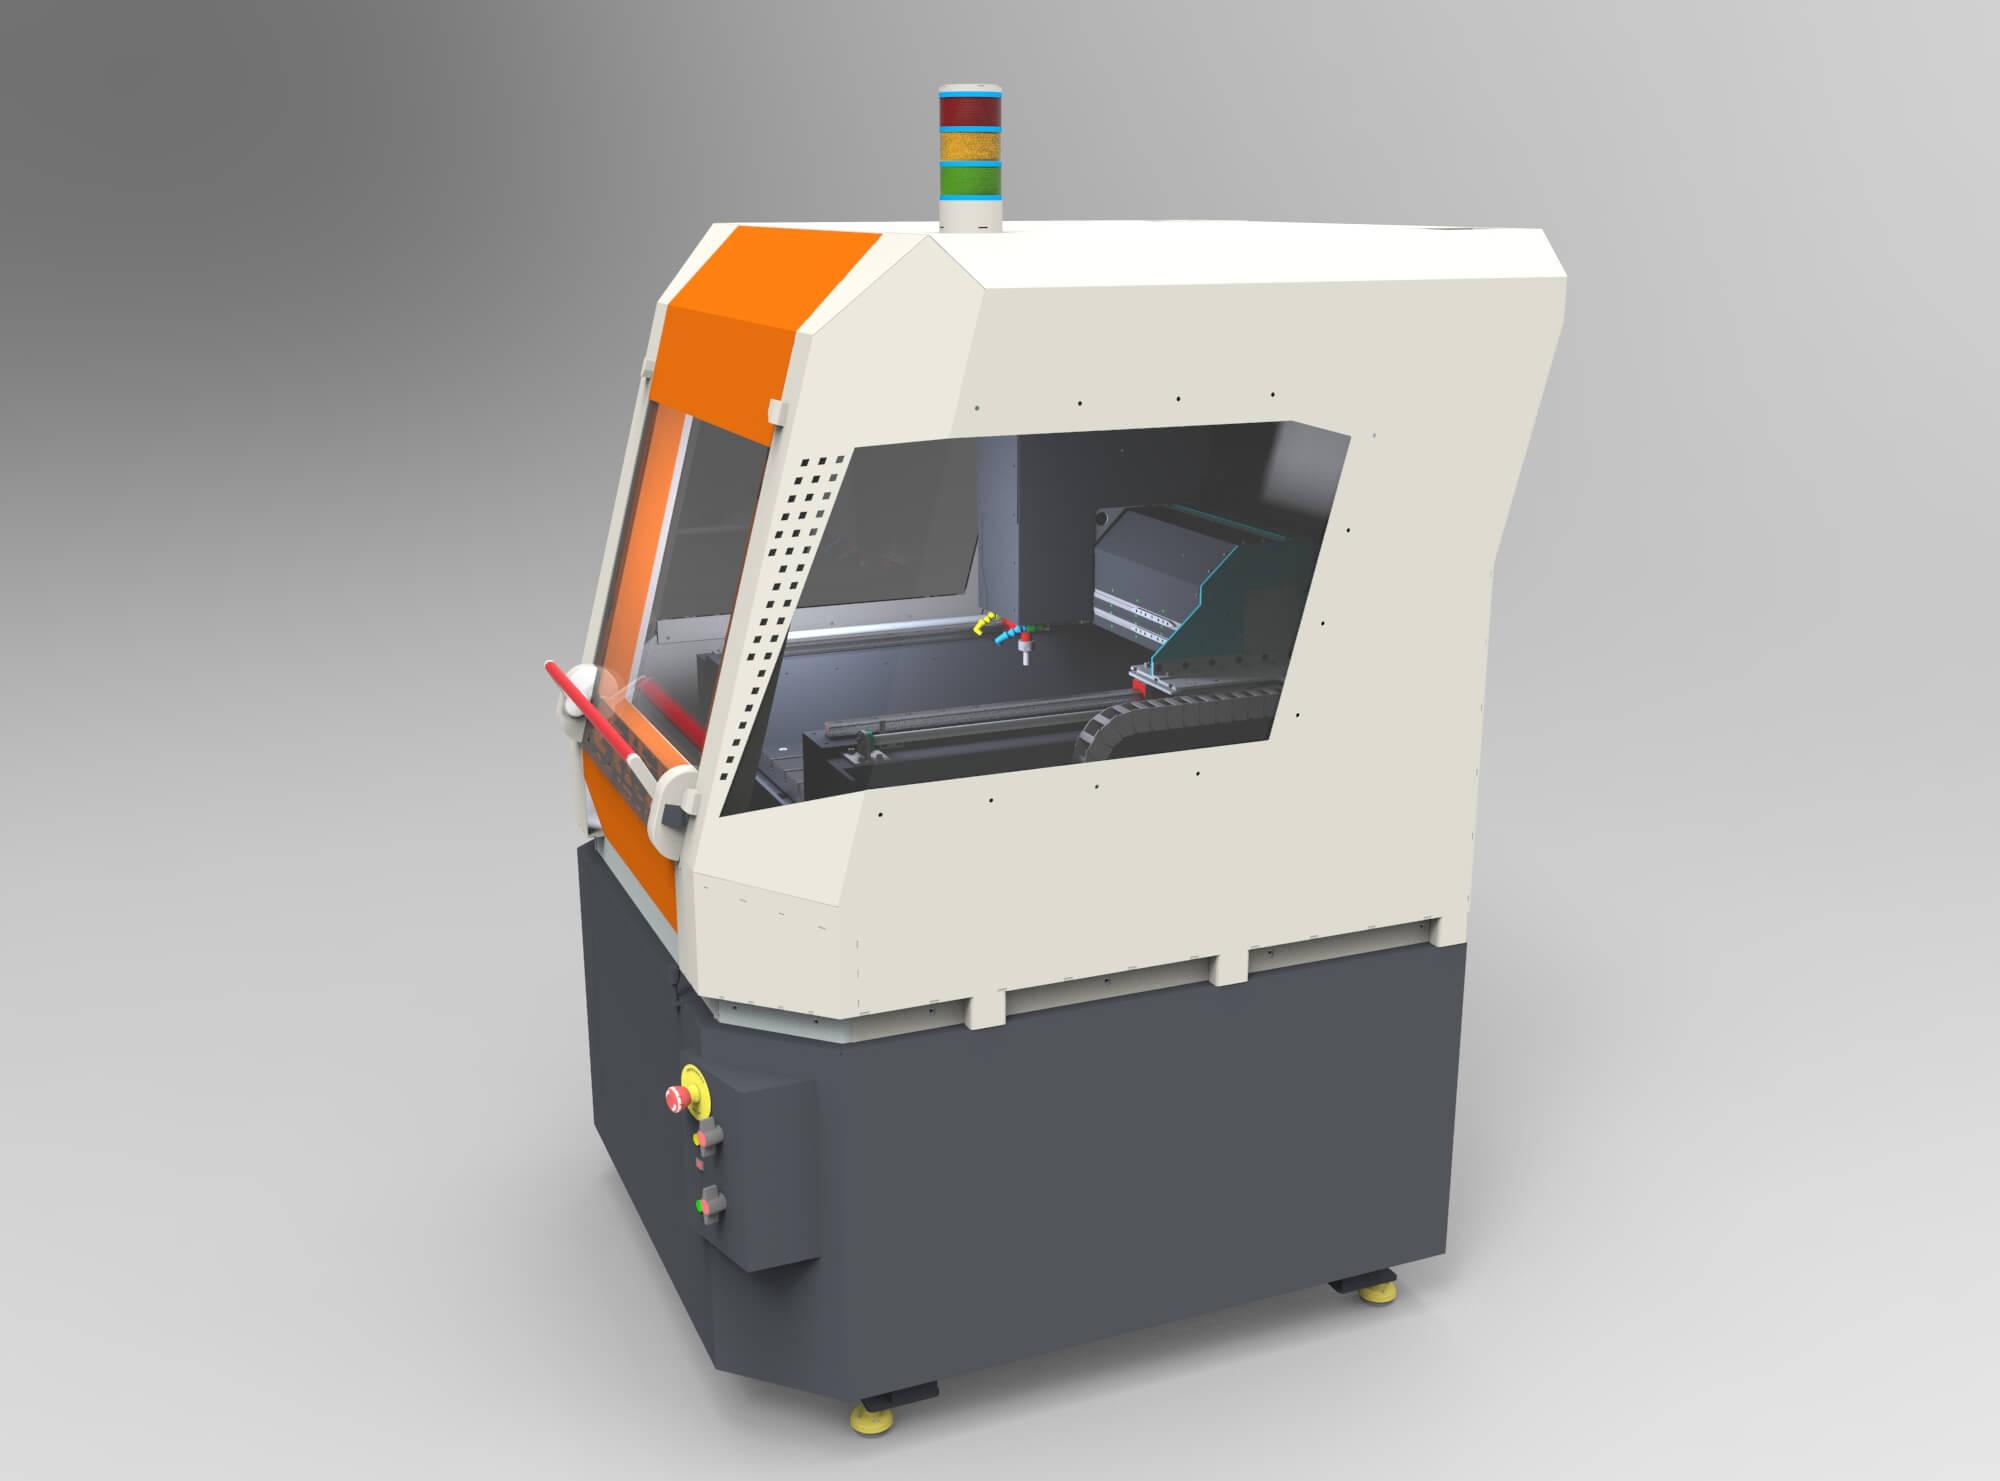 CNC-Maschinen Serie intelligente Werkzeugmaschinen